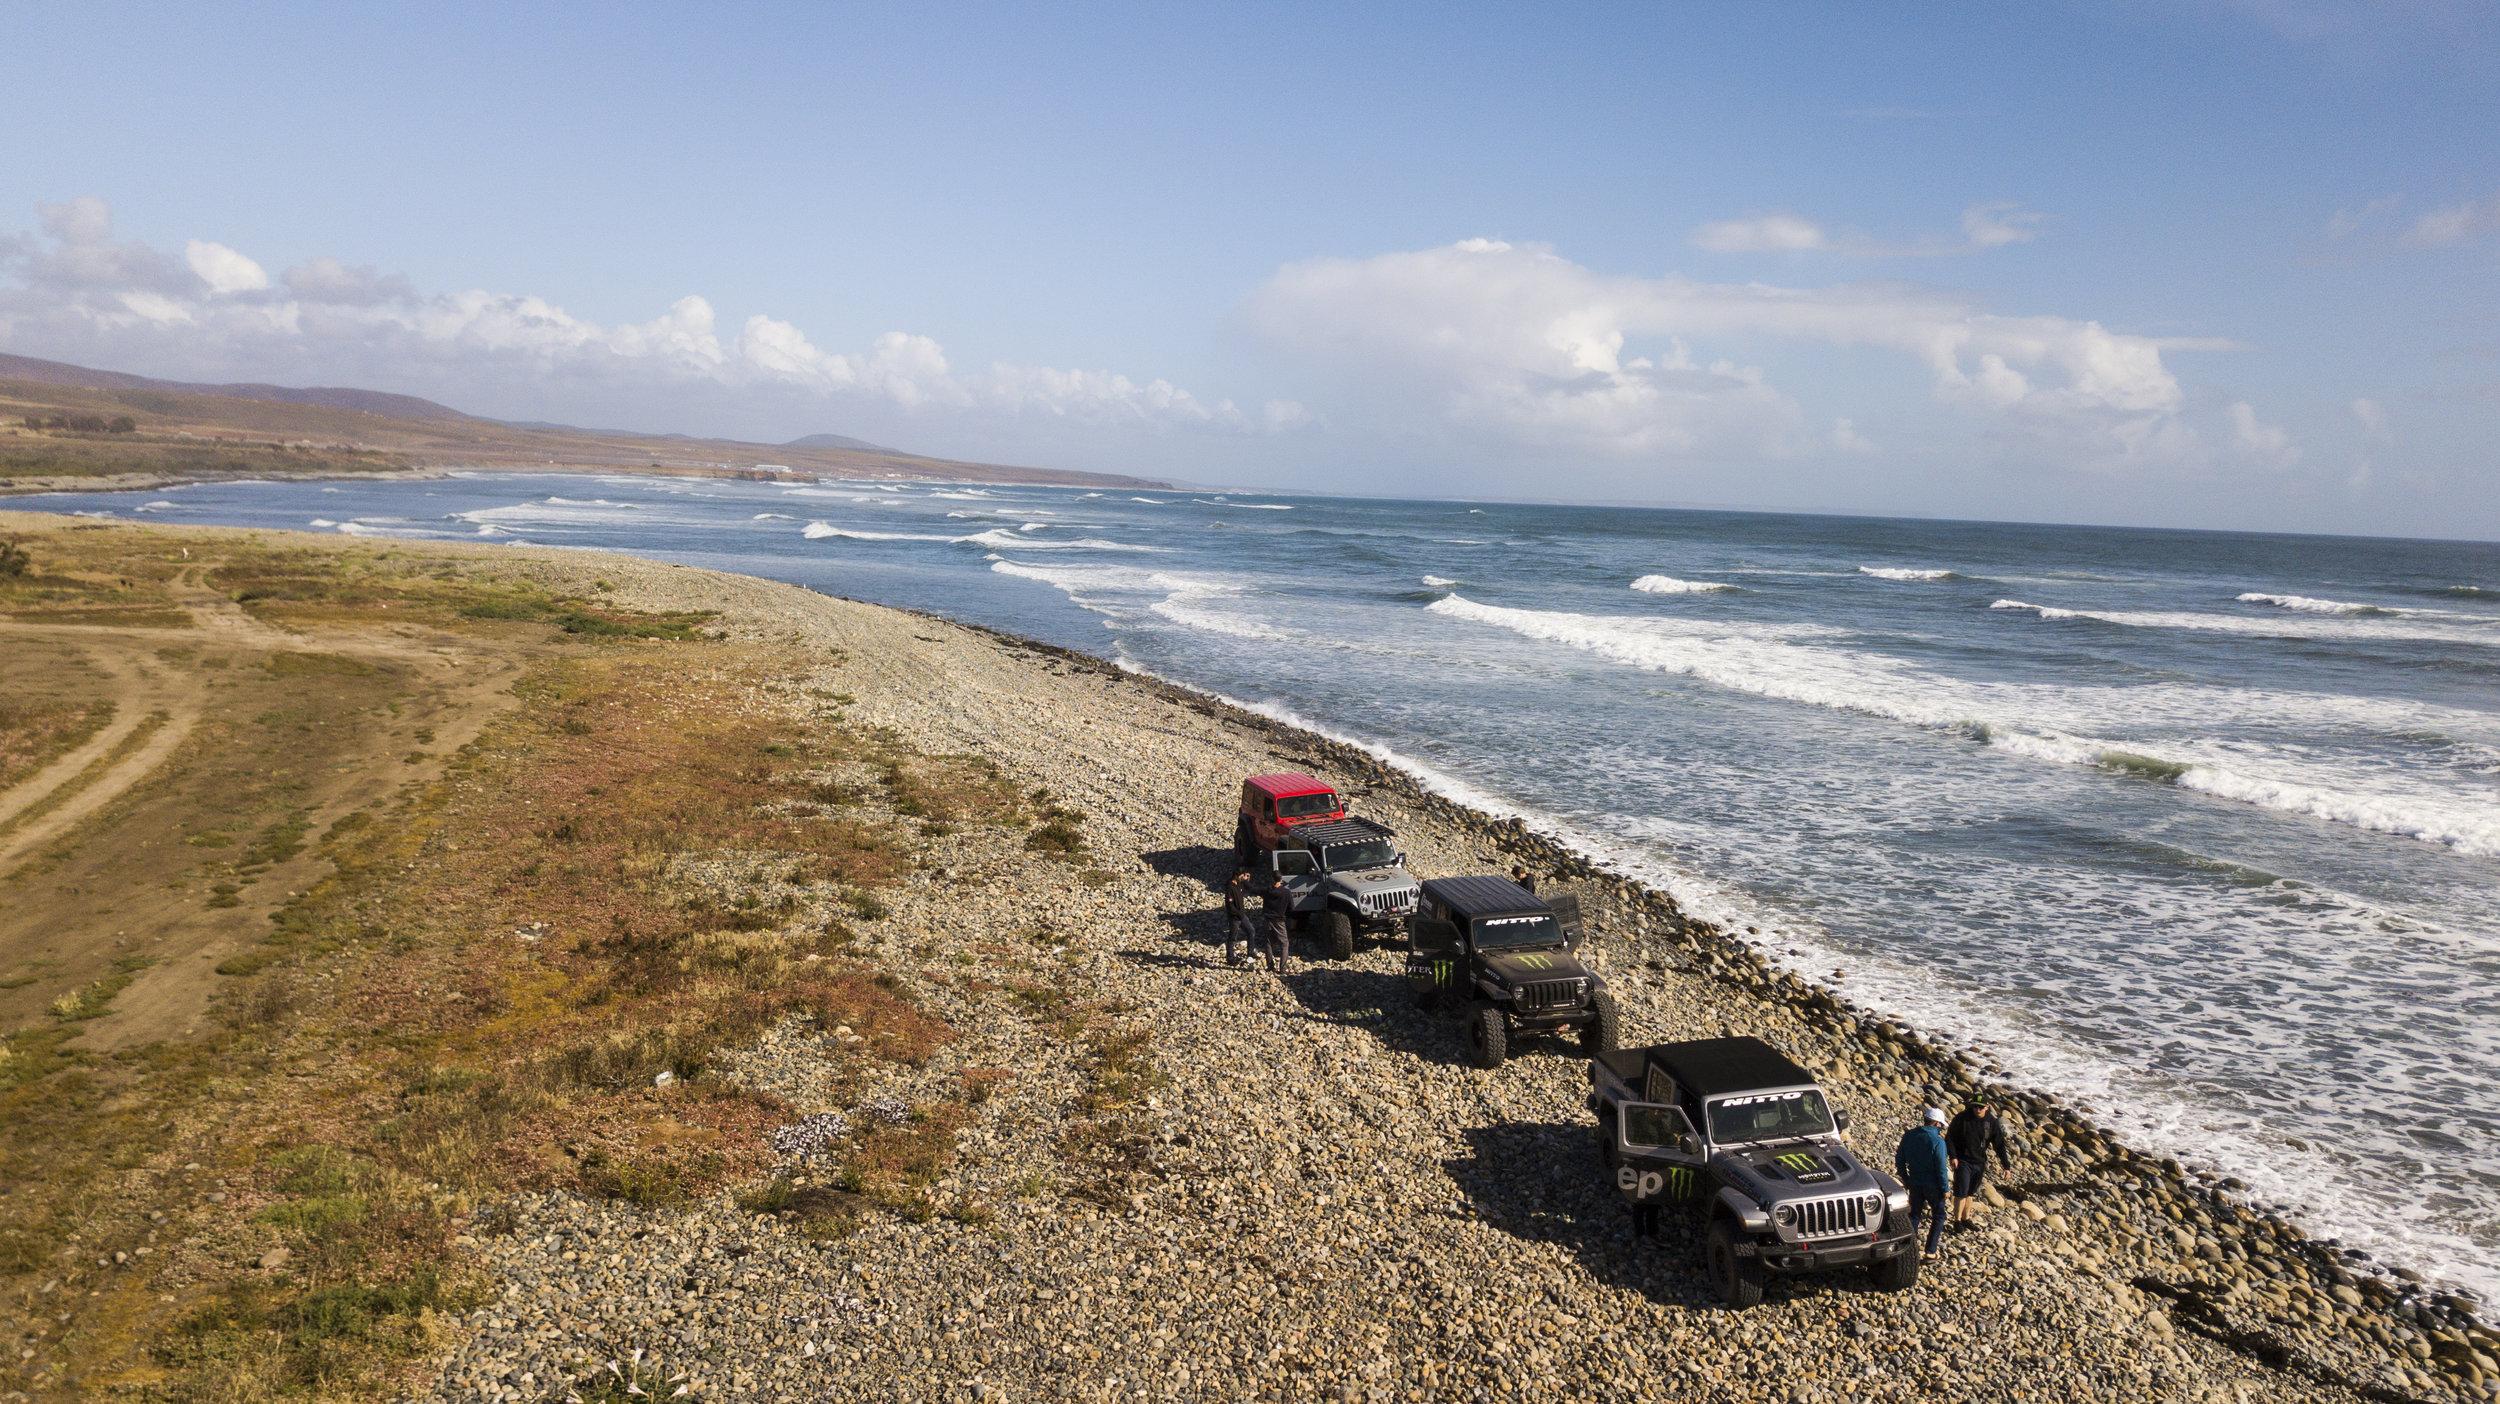 6_24_CaseyCurrie_Baja500PreRunning_BajaMexico_Jeep_018.jpg